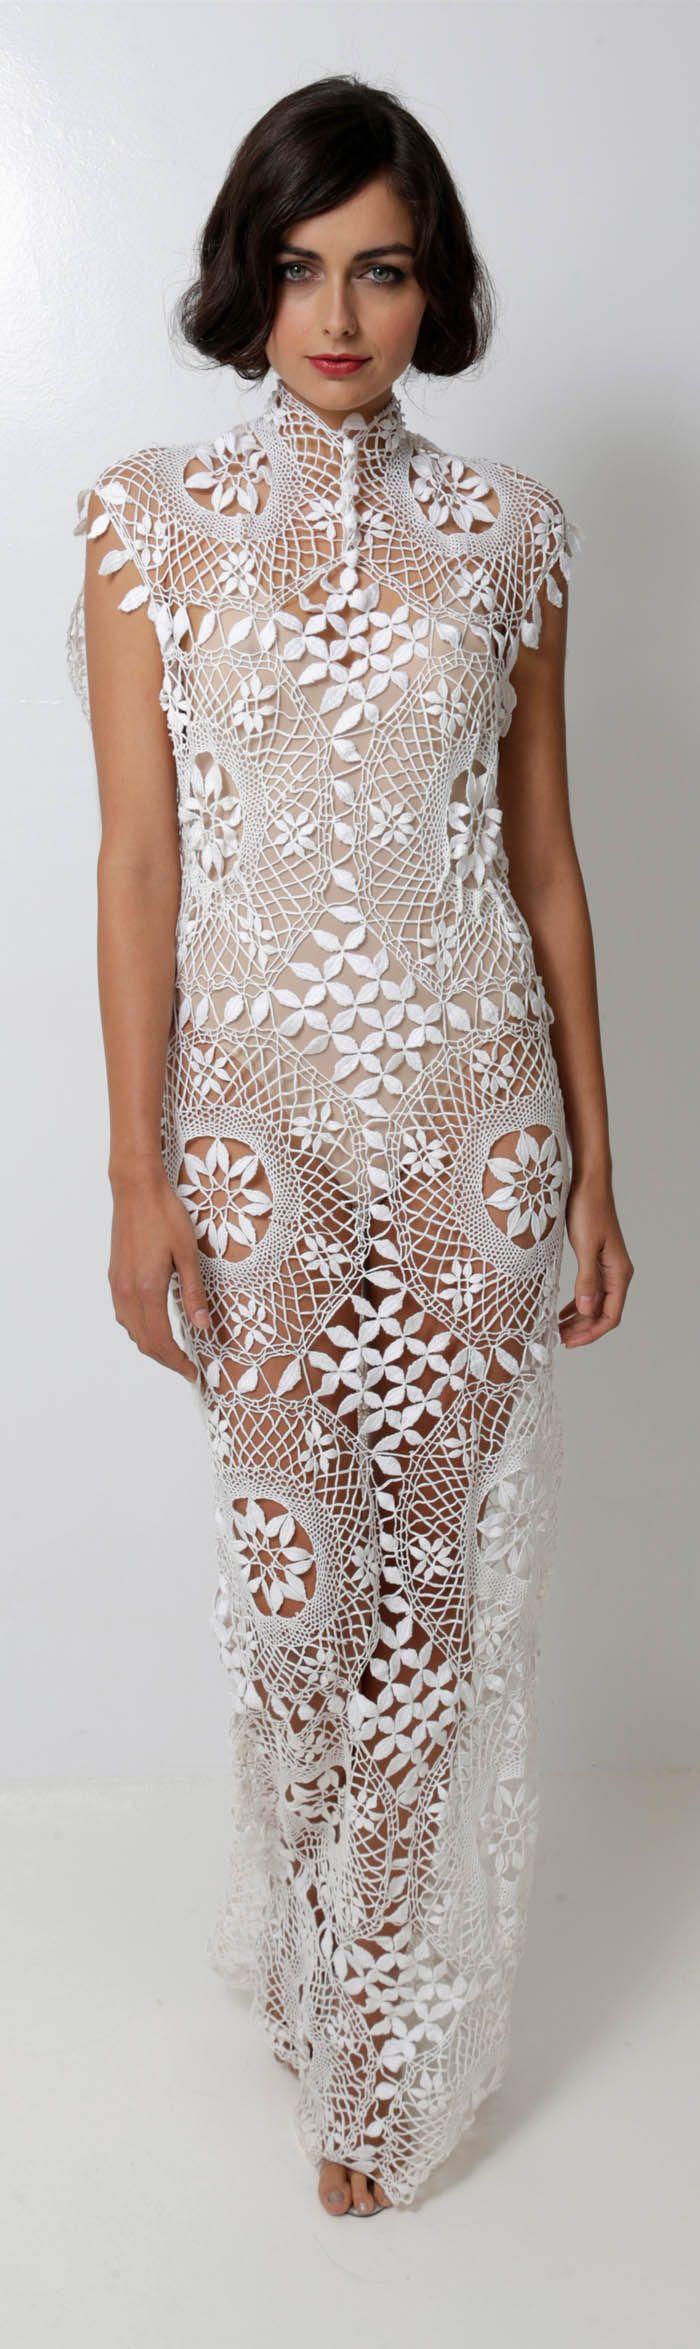 Lace bra under dress september 2019  best Кружево images on Pinterest  Weddings Blouses and Boleros